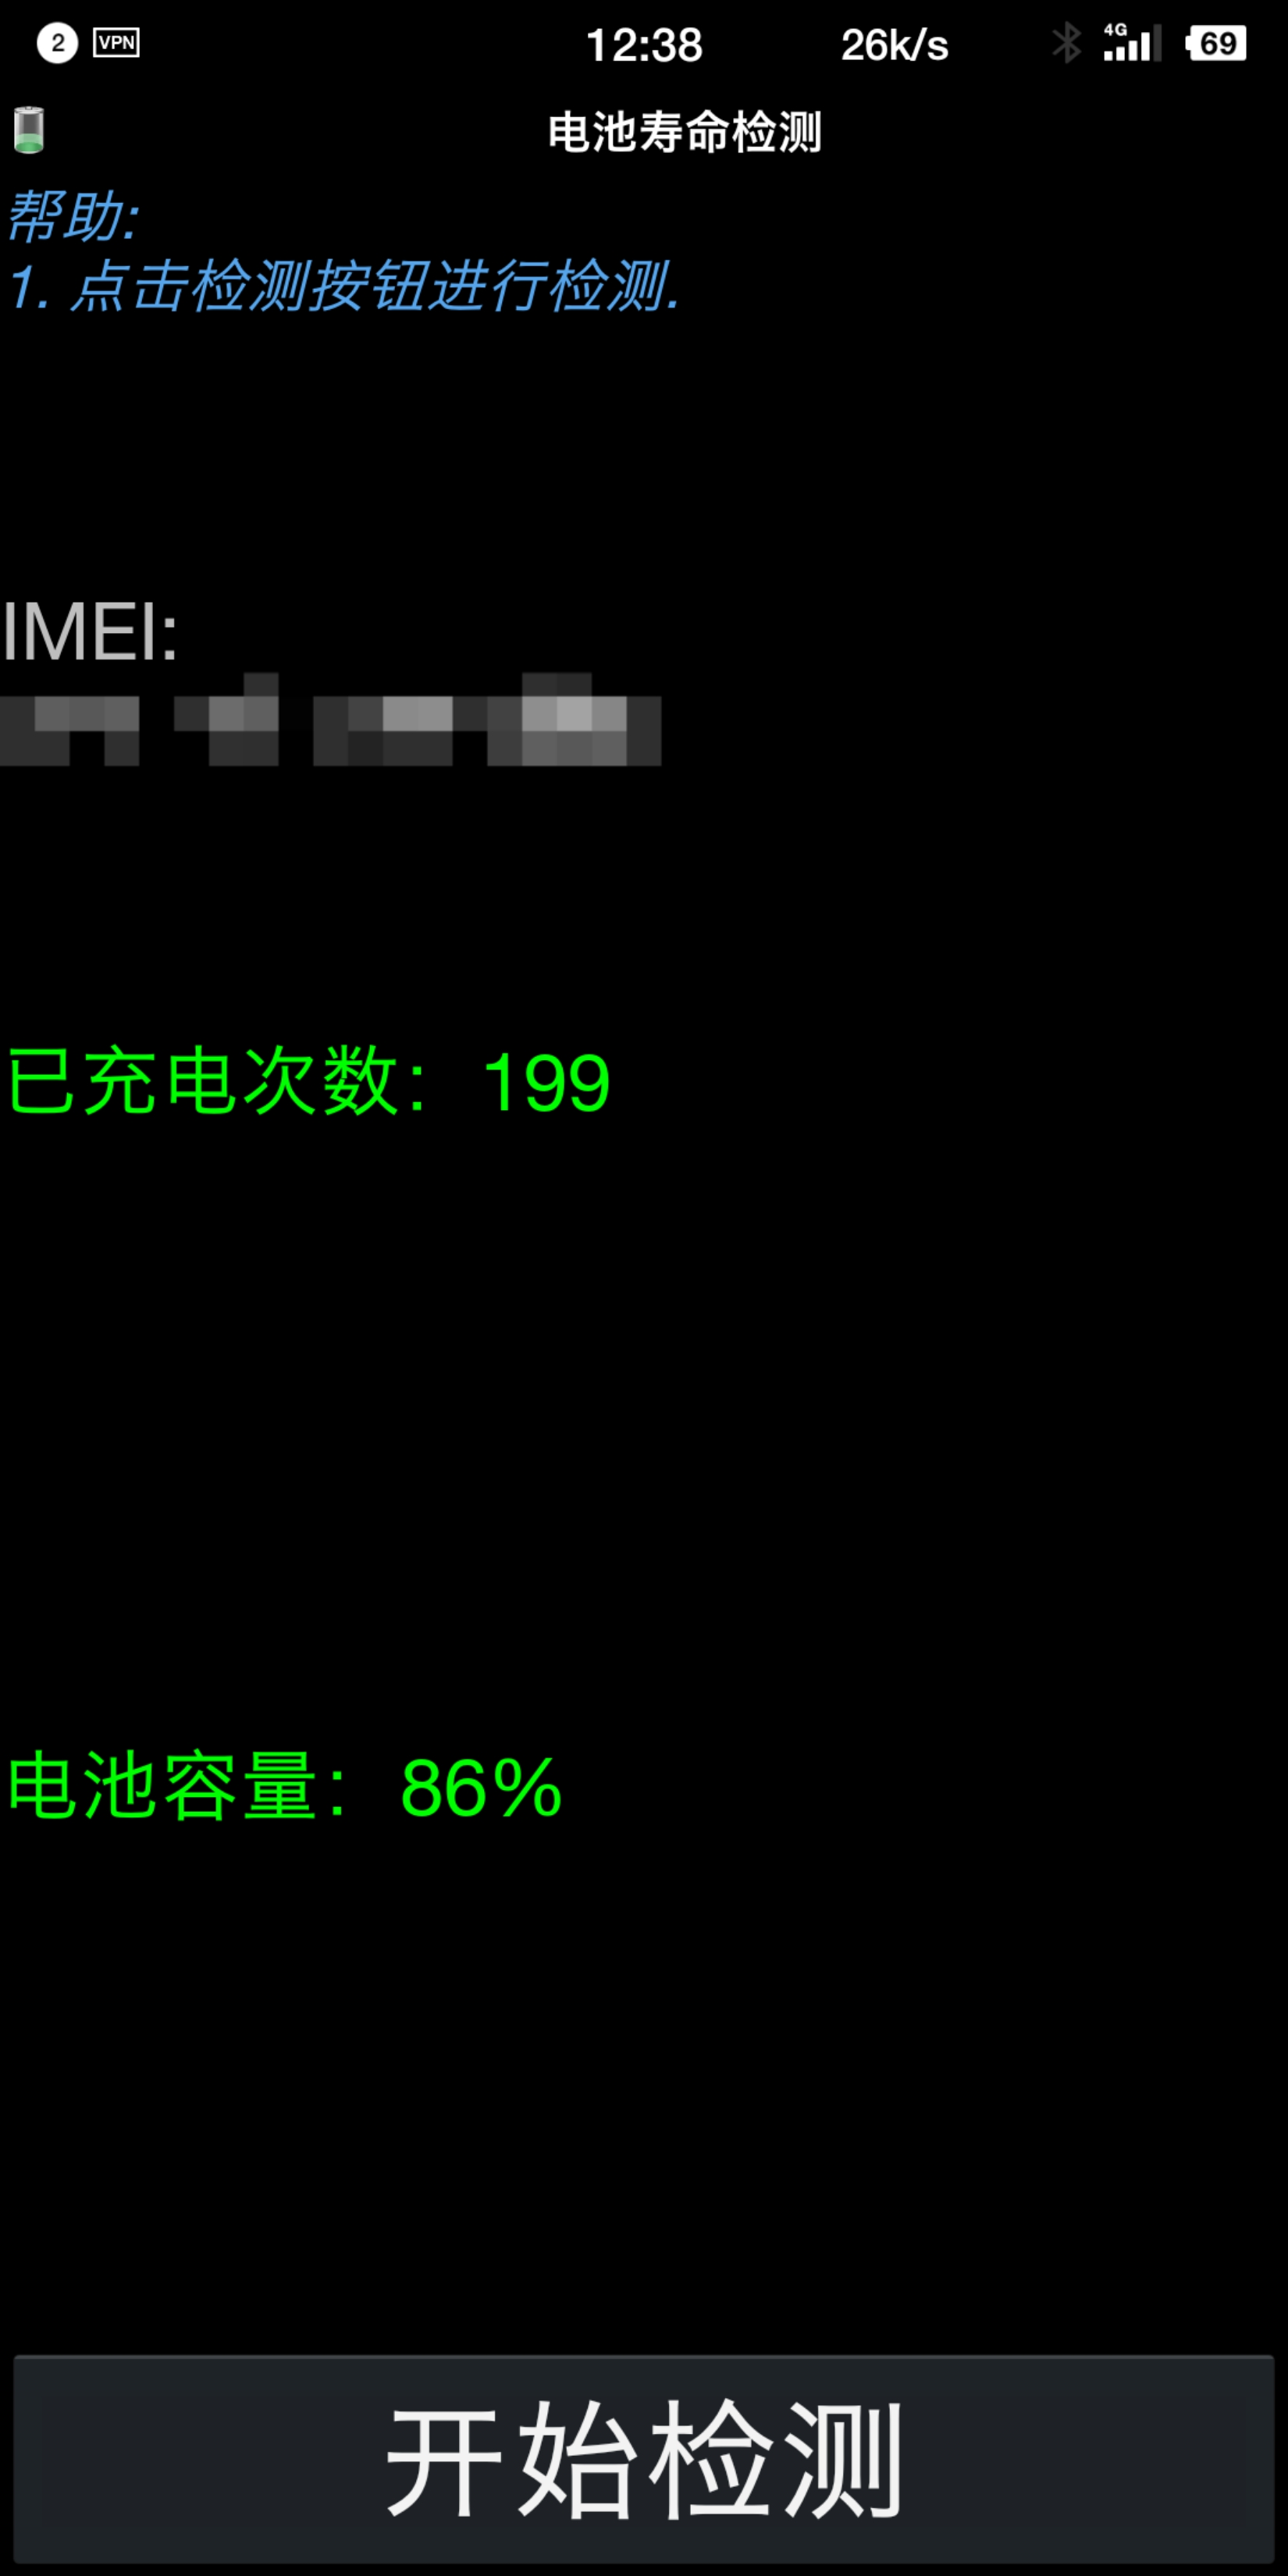 ??_Screenshot_2019-03-08-12-38-39-837_??????.png